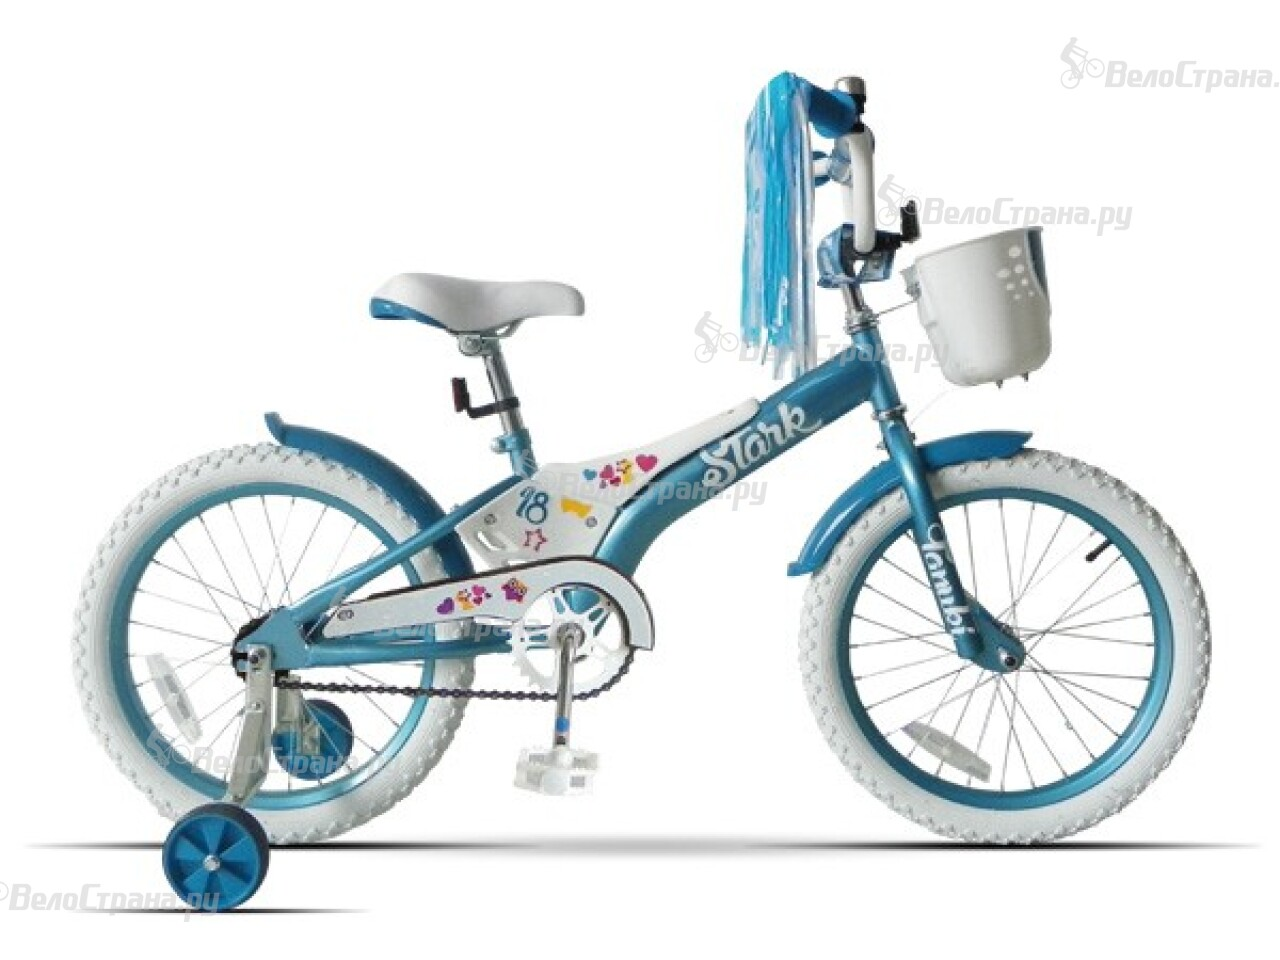 Велосипед Stark Tanuki 18 (2015) велосипед stark shooter 4 2016